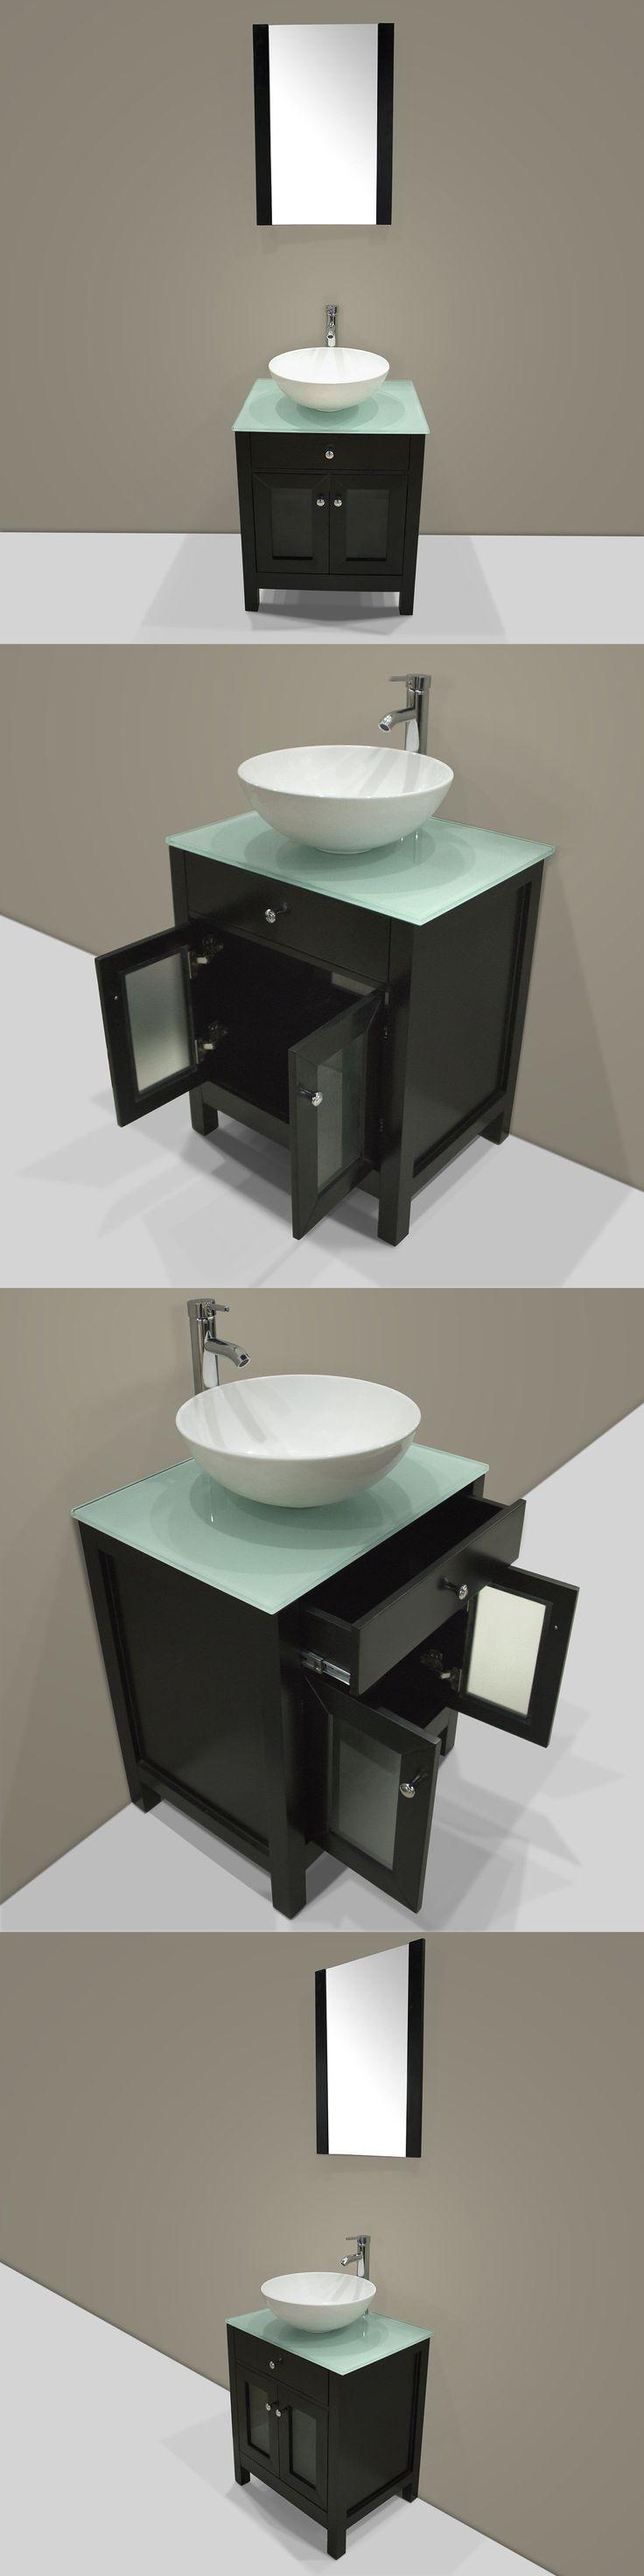 10 beste ideeà n over bathroom basin cabinet op pinterest